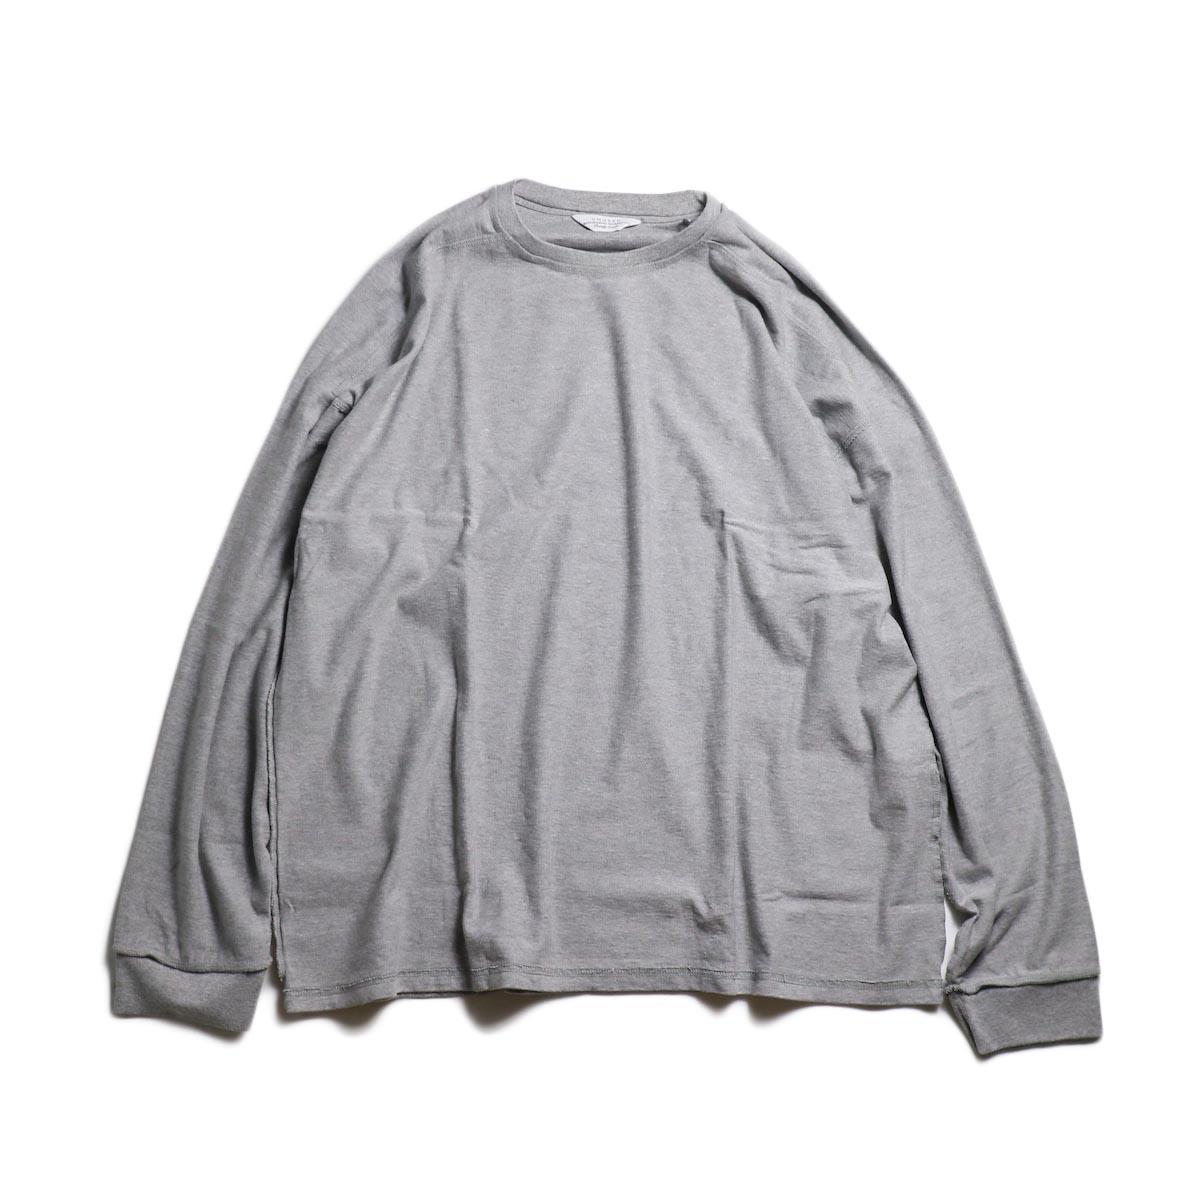 UNUSED / US1686 Long Sleeve T-Shirt -Heather Gray